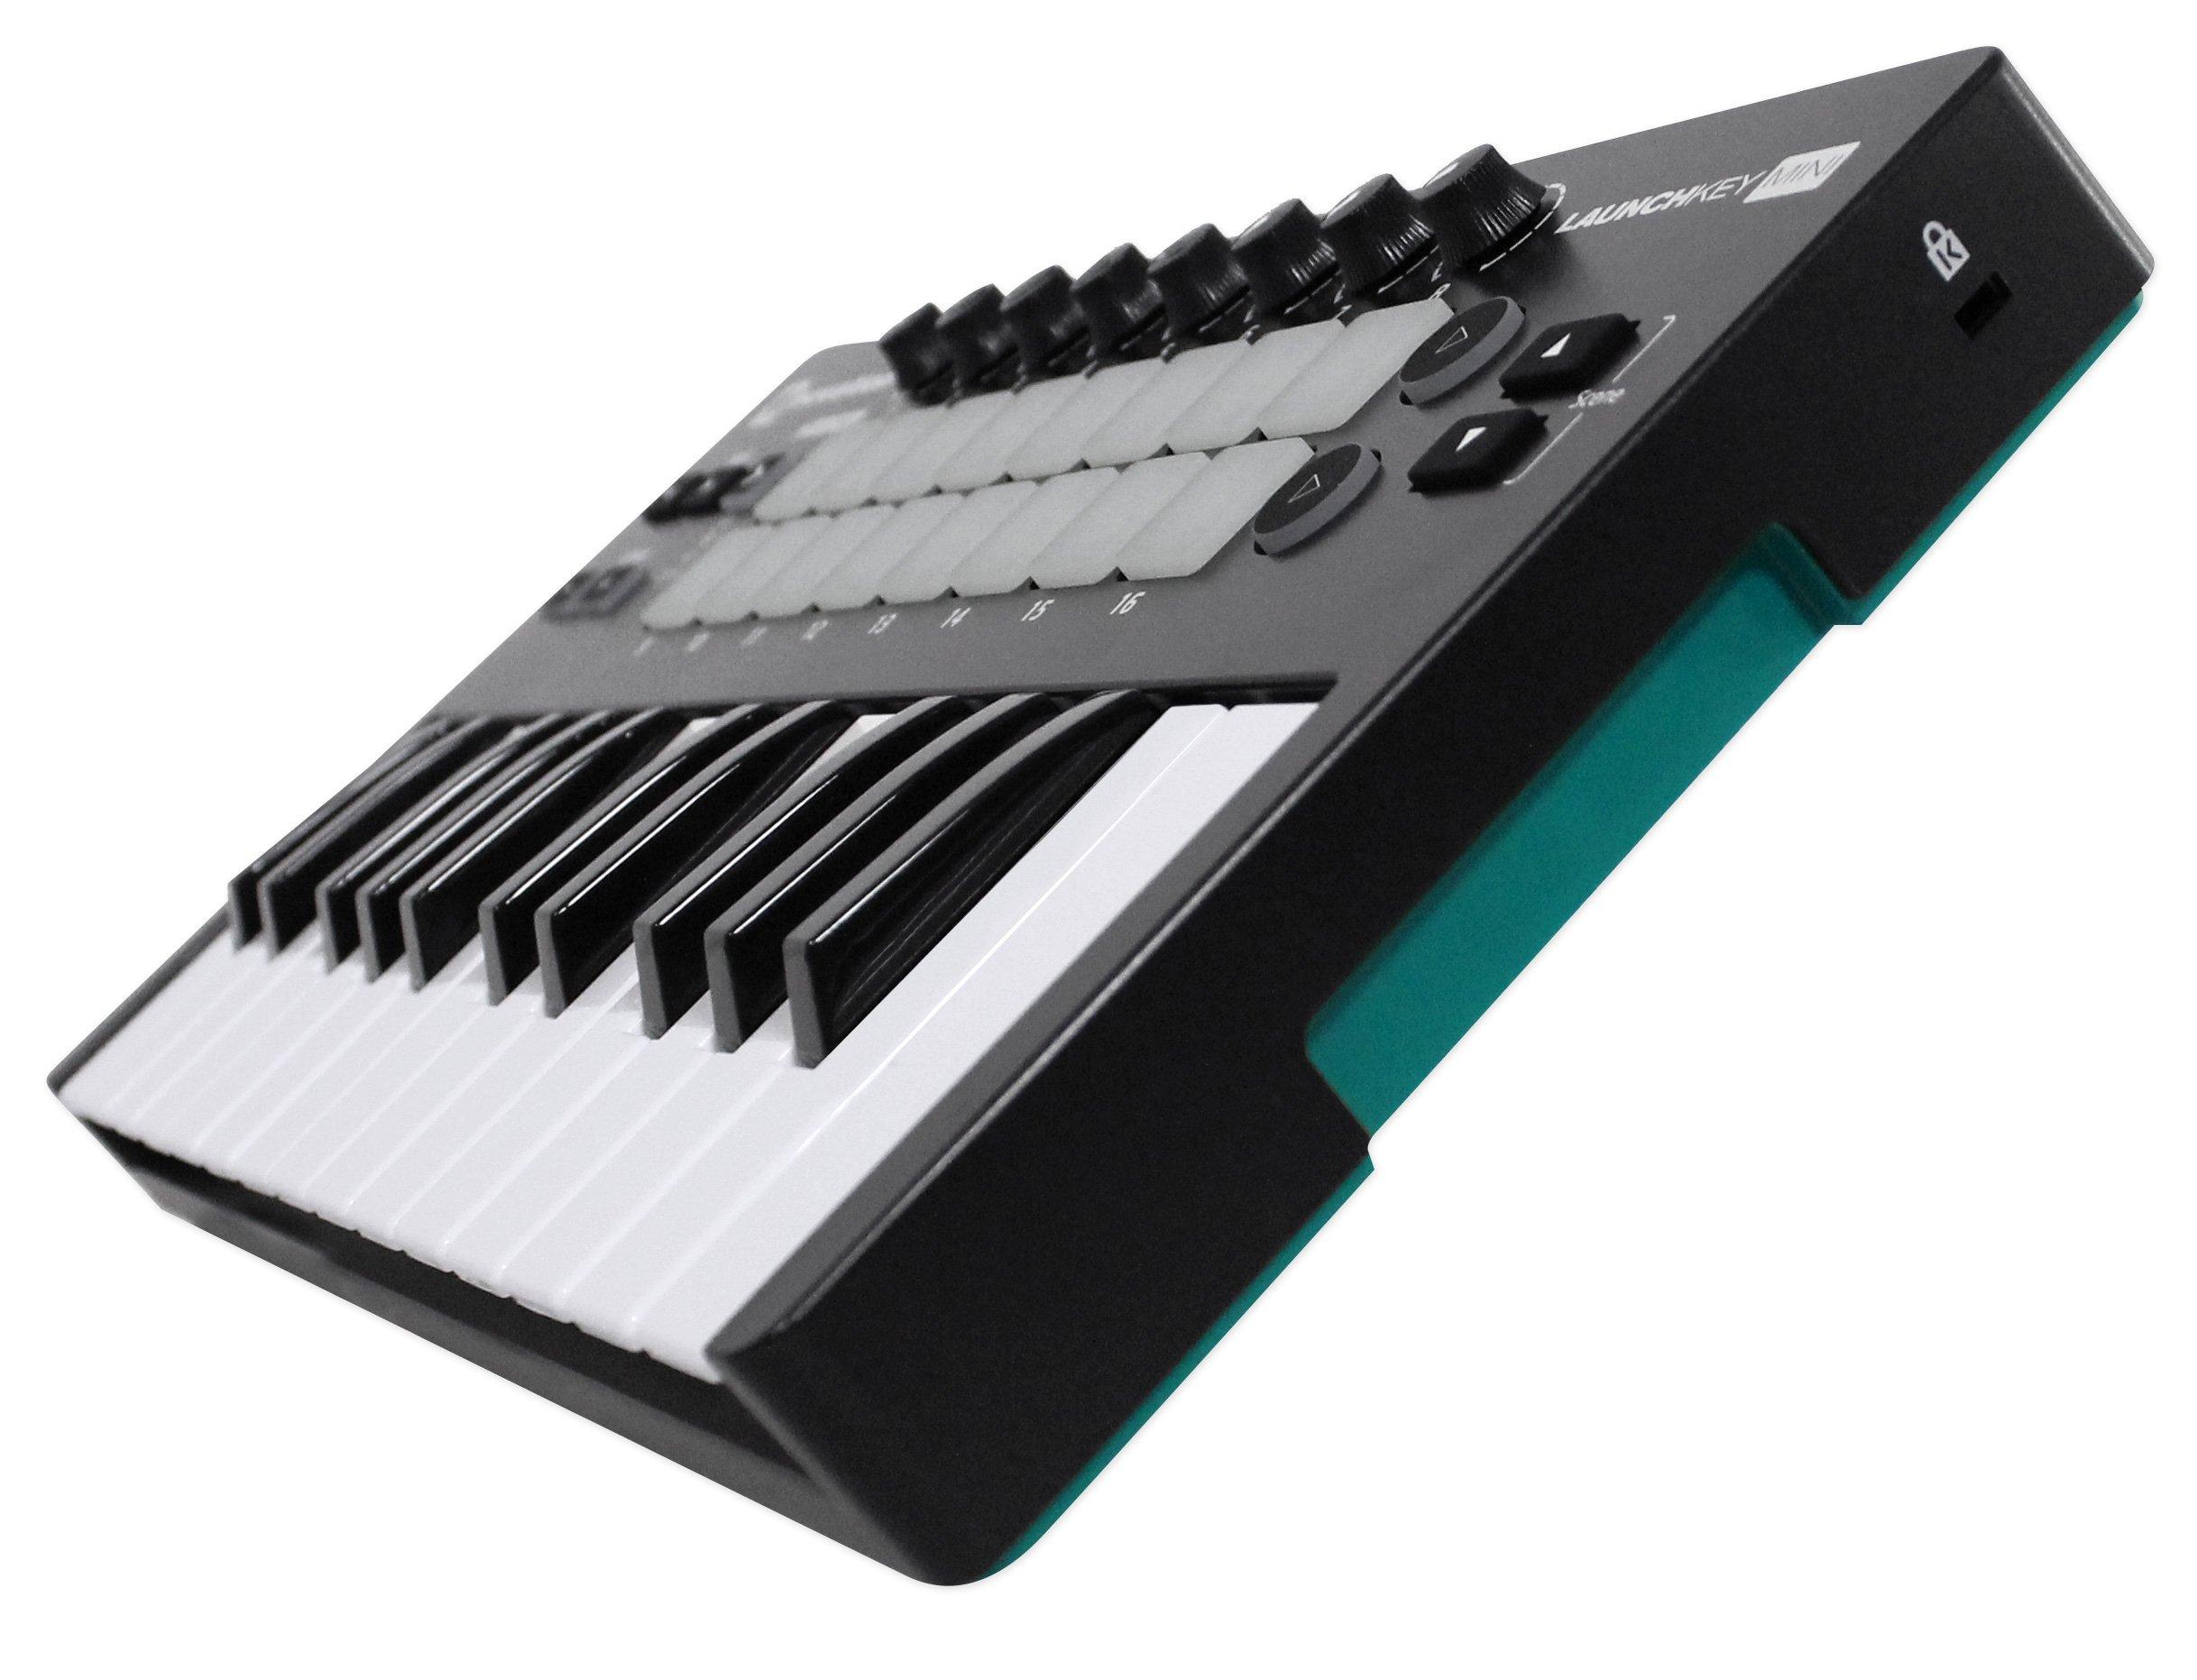 Novation LAUNCHKEY MINI MK2 25 Key USB Keyboard Controller+Bluetooth Speaker by Nov (Image #4)